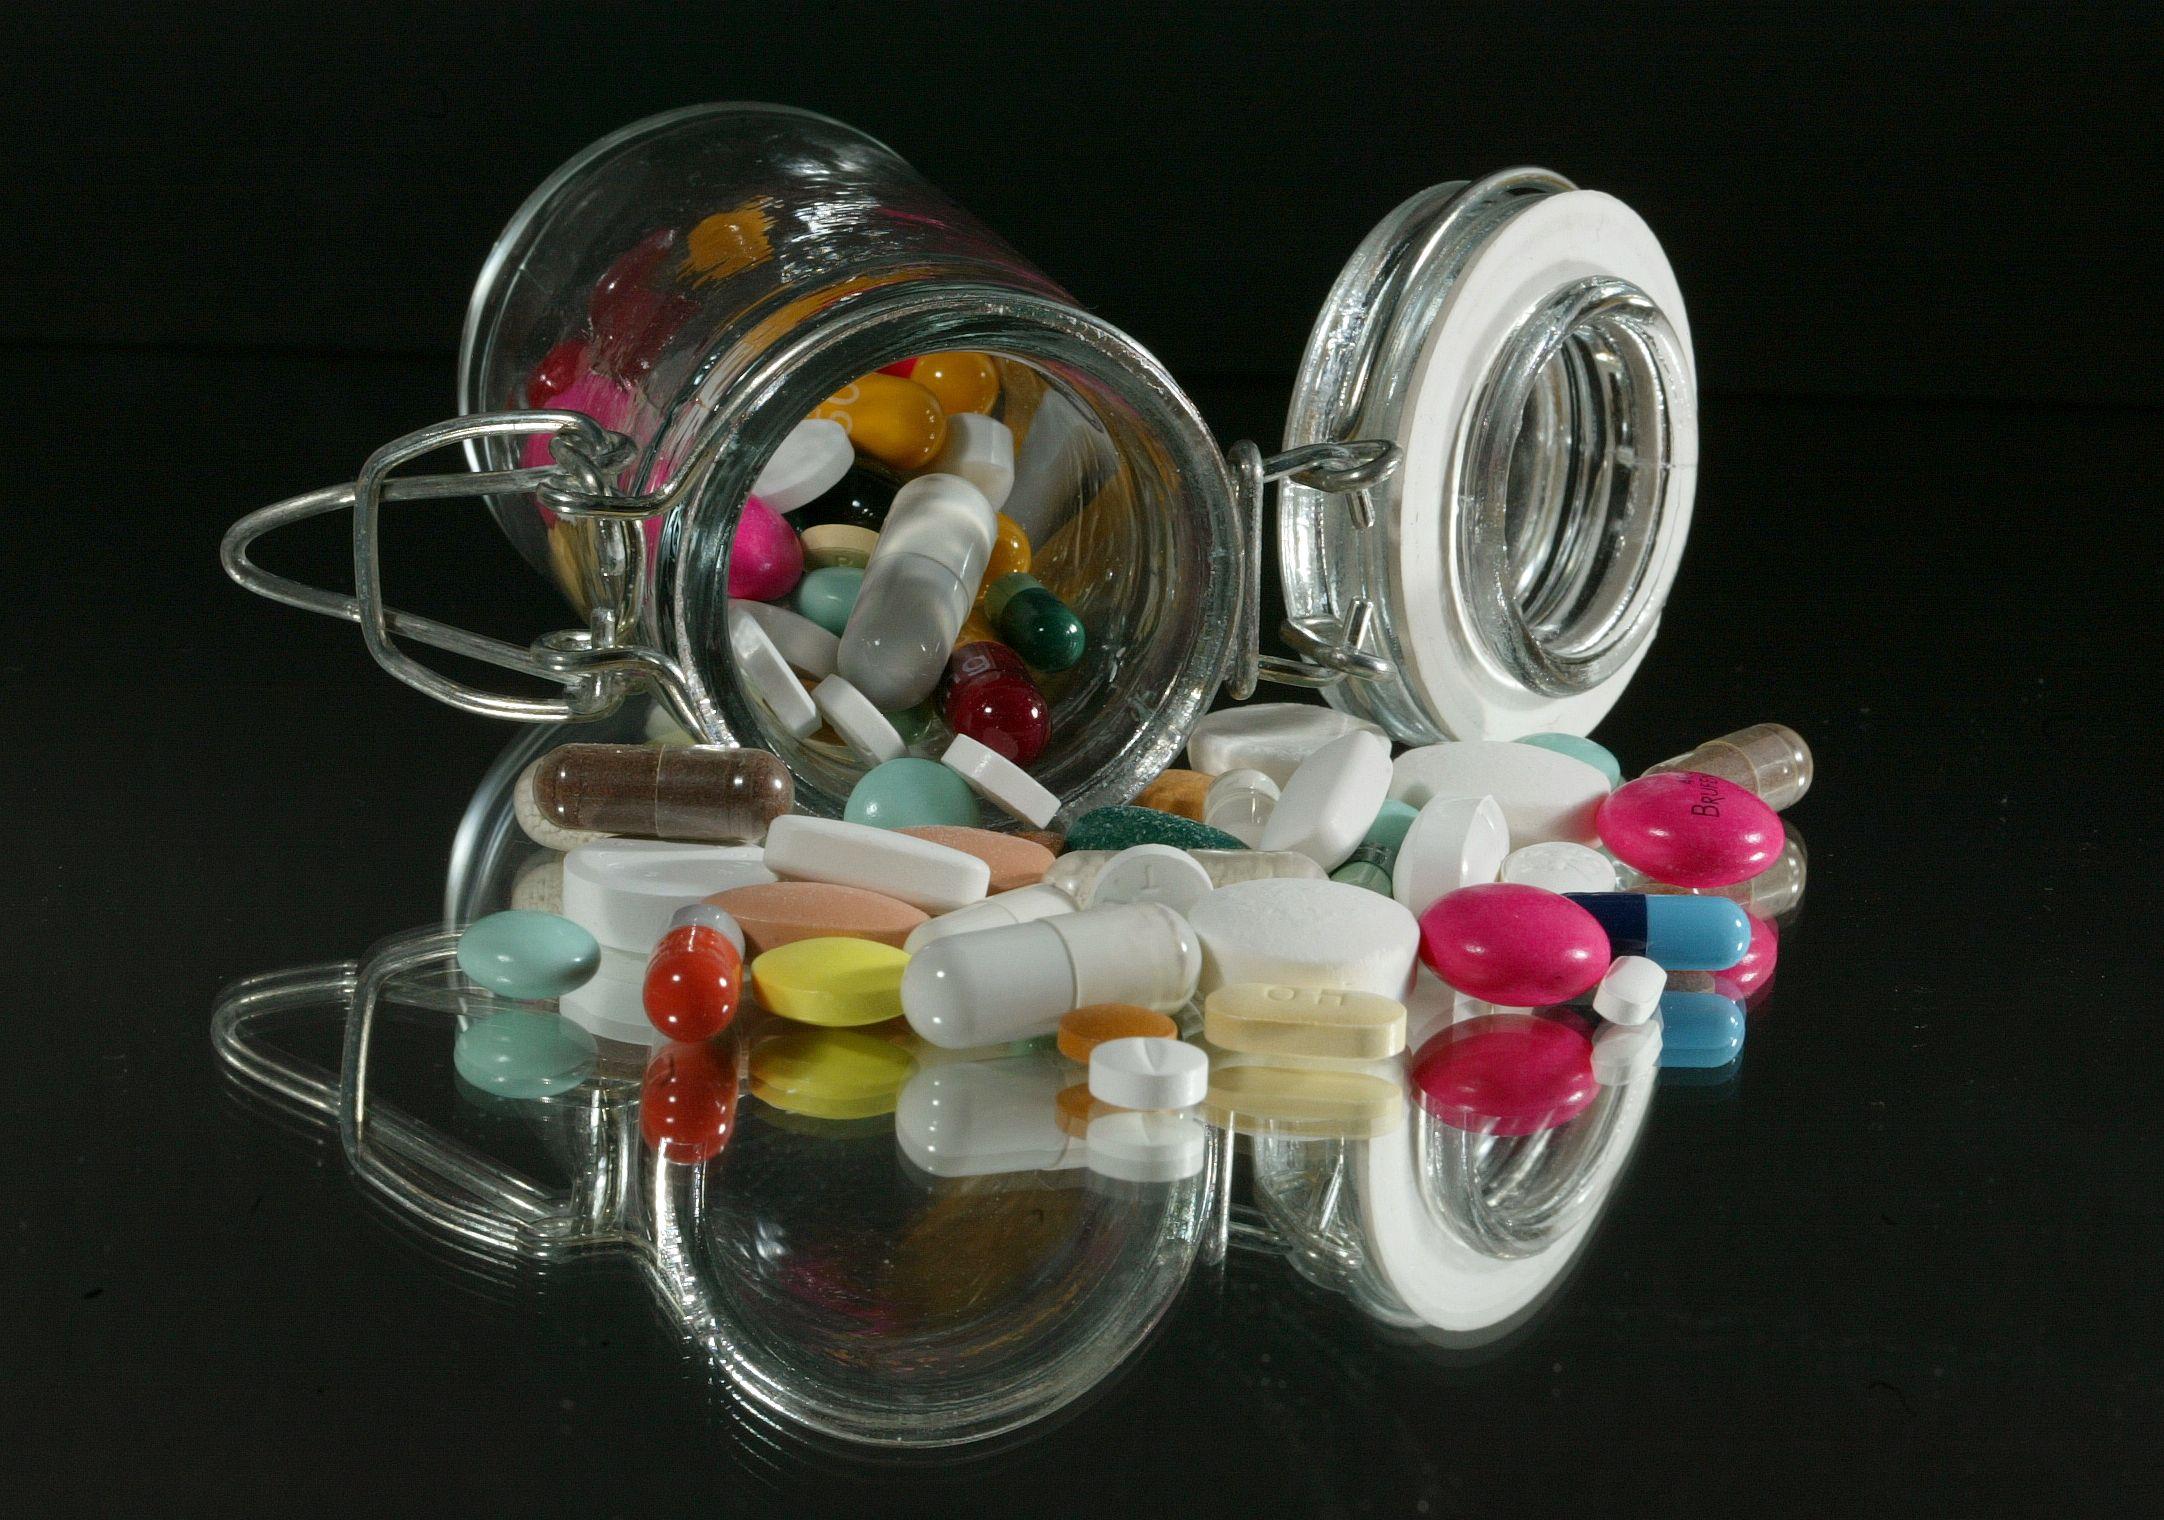 09_01_drugs_01